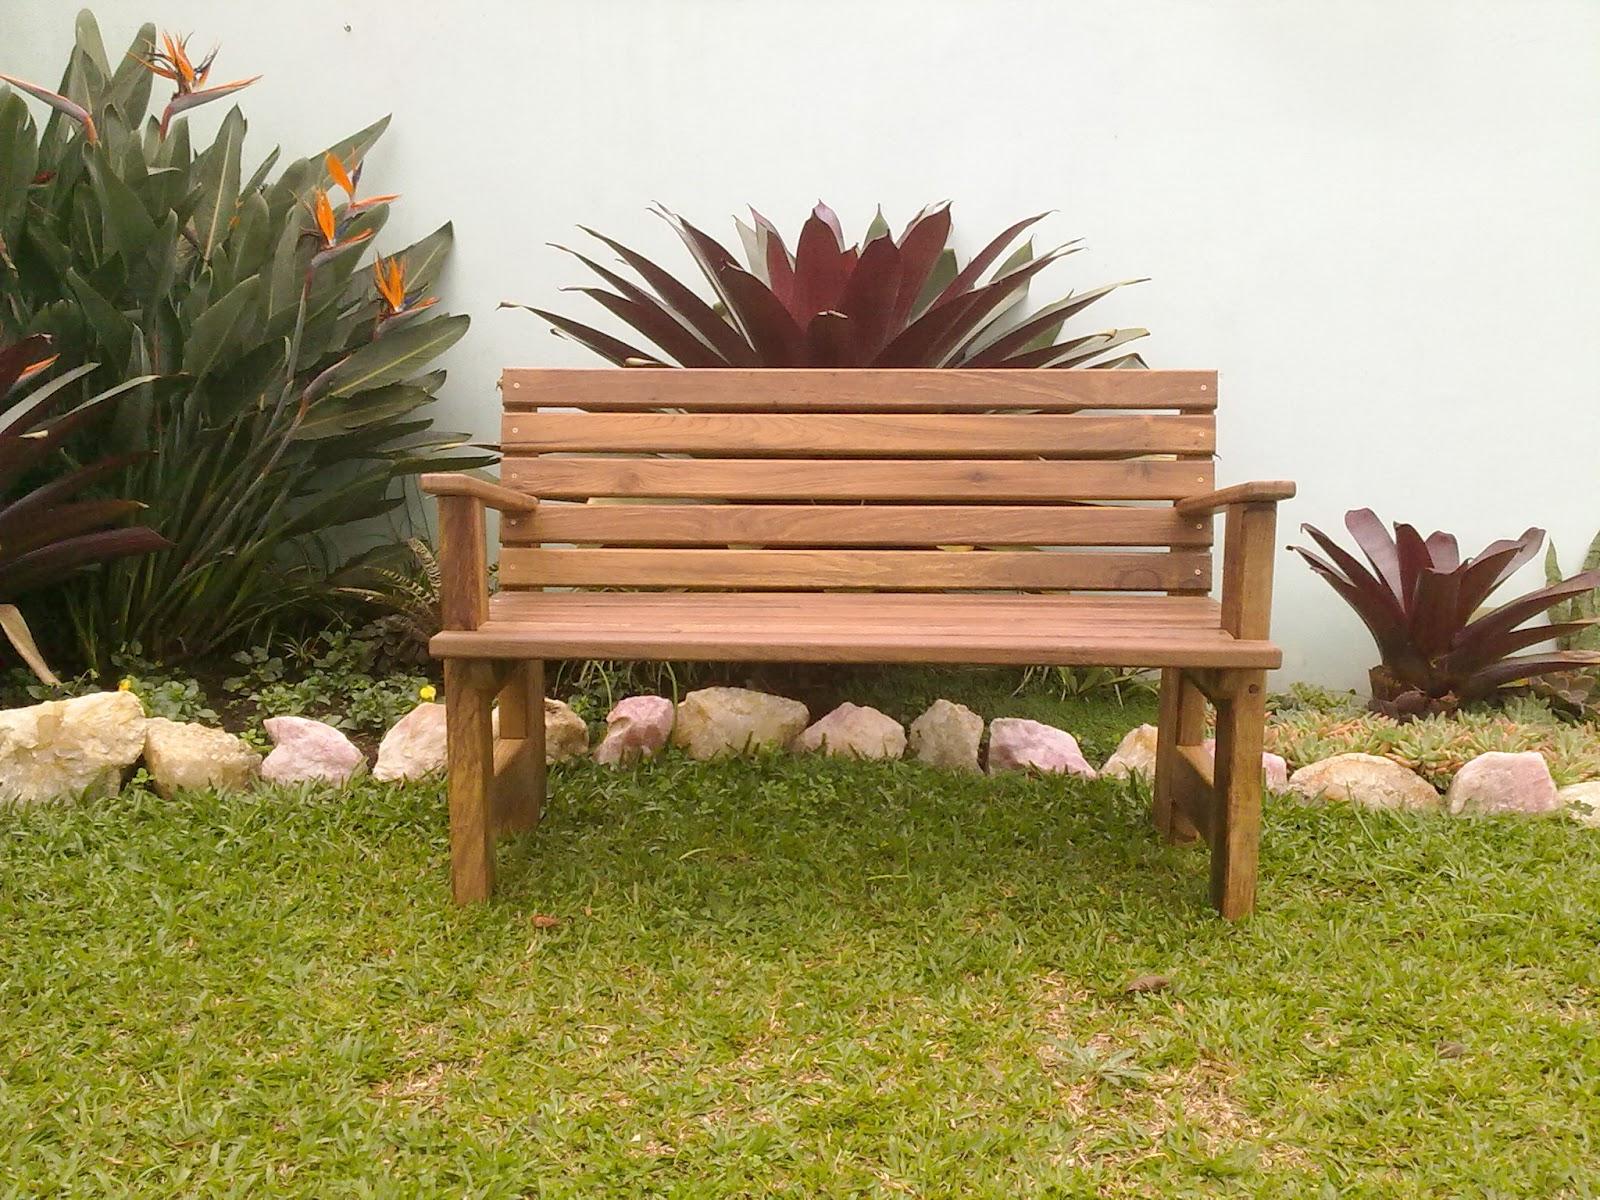 Cachepots  Marcenaria Artesanal Bancos para jardim em Imbuia [2